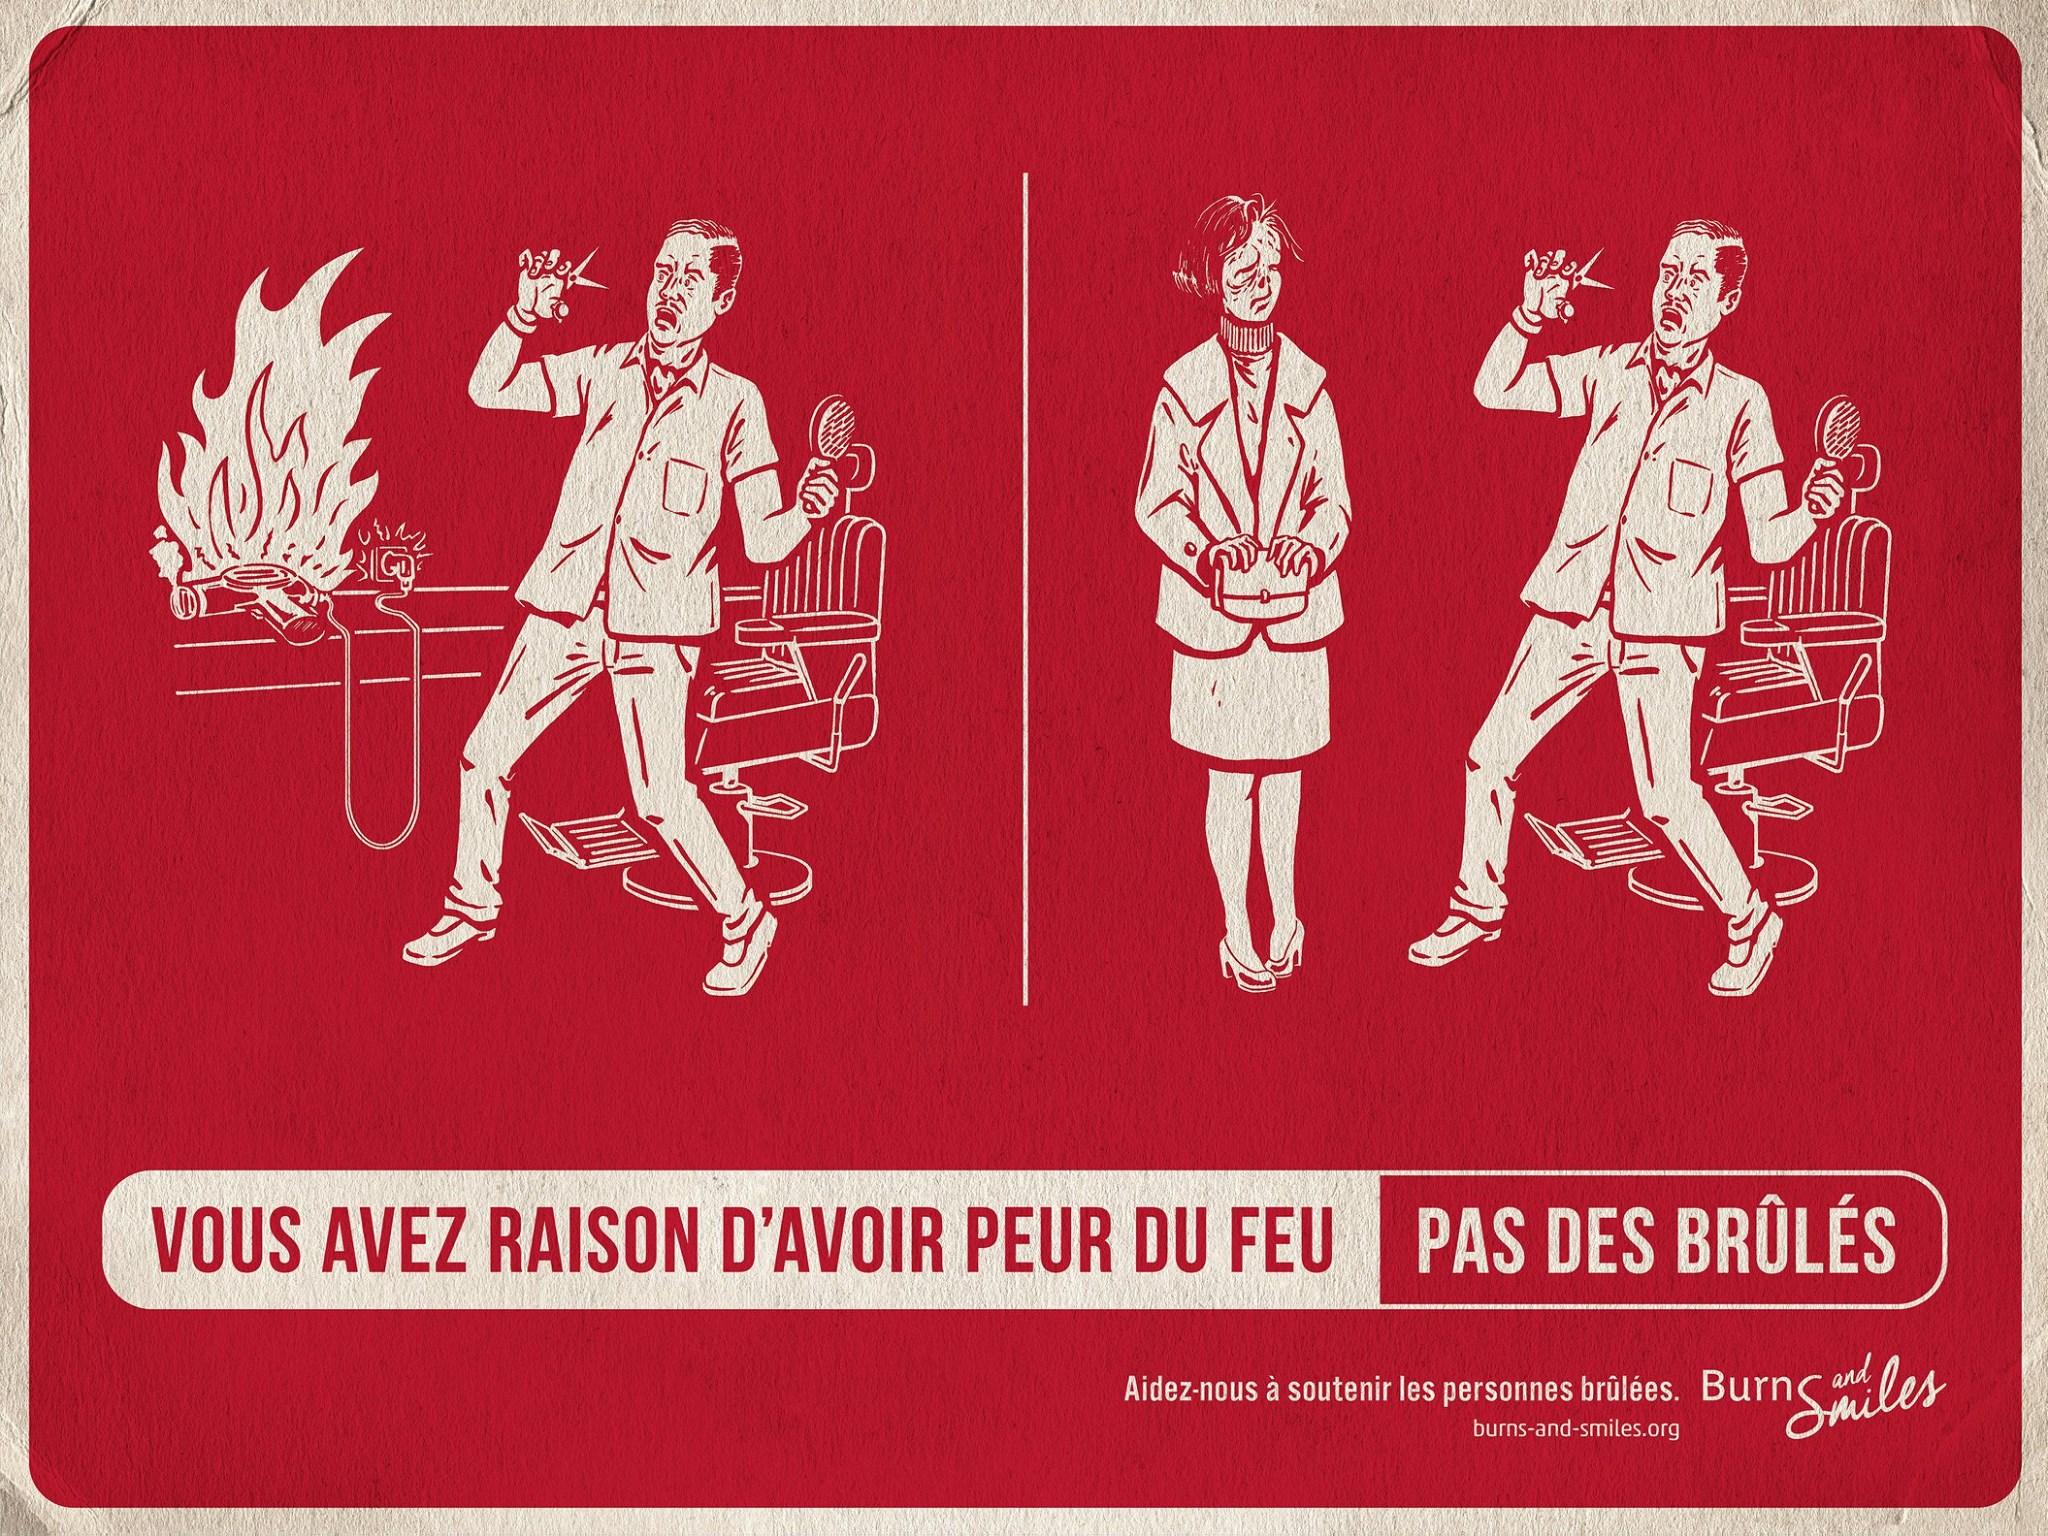 burns-and-smiles-publicite-communication-print-press-ad-feu-brules-burn-agence-tbwa-paris-1